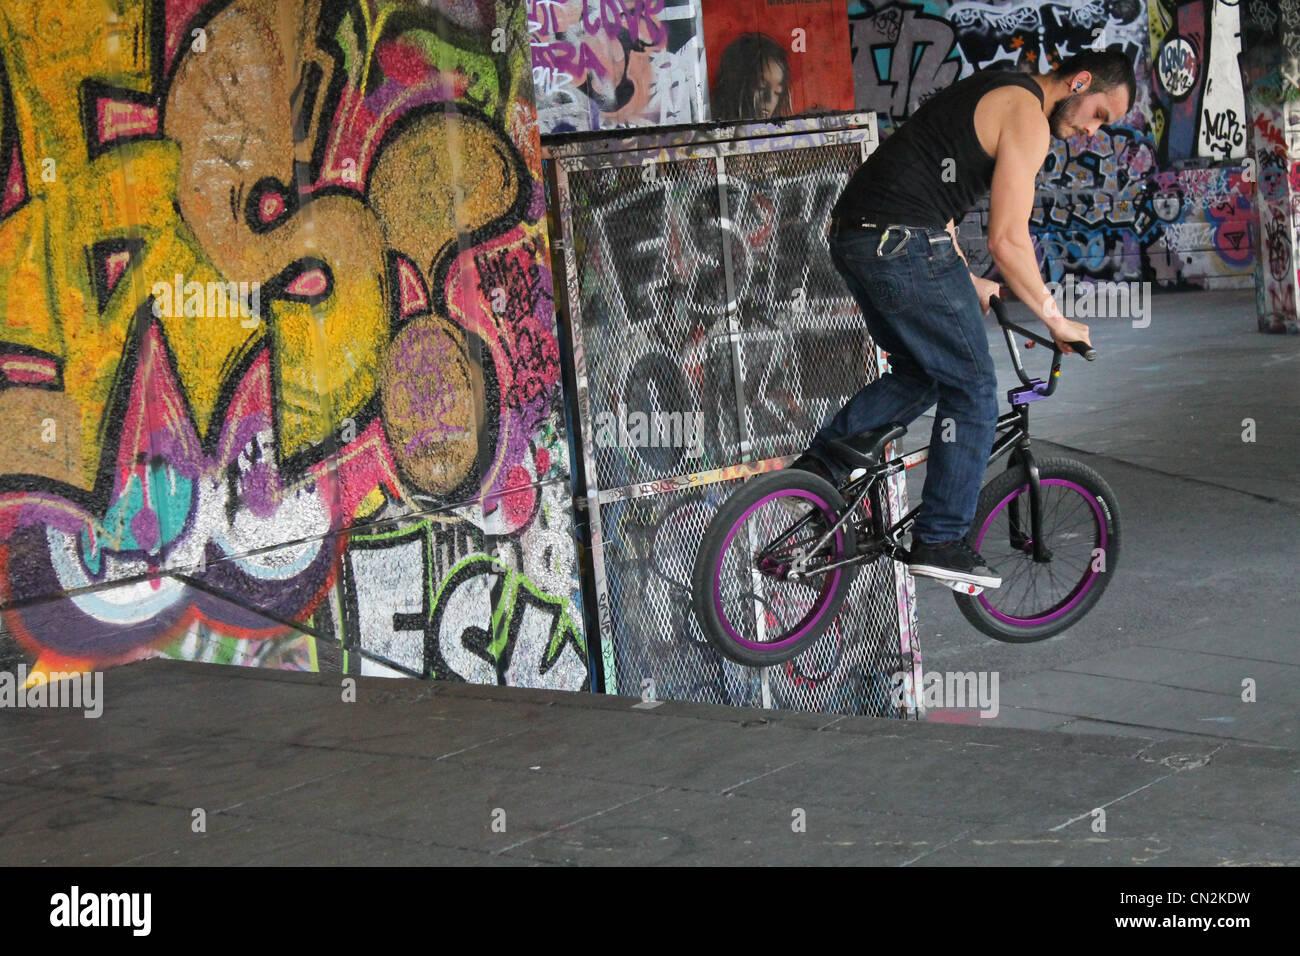 bmx, bmx rider, bmx stunts, bike tricks, bmx tricks - Stock Image